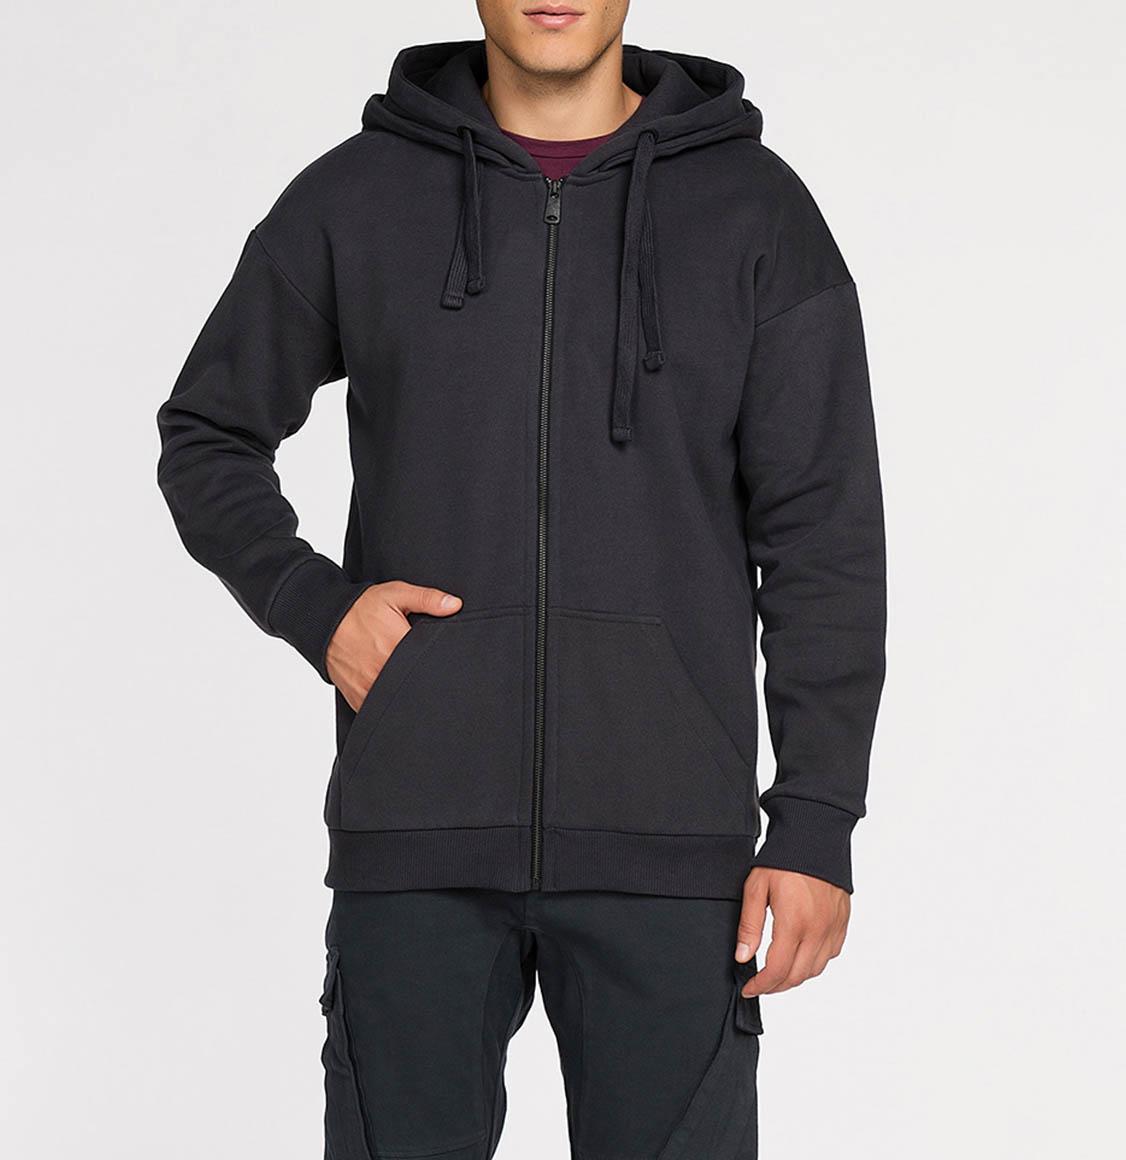 Organic Cotton Double Hooded Zip Up Charcoal Grey